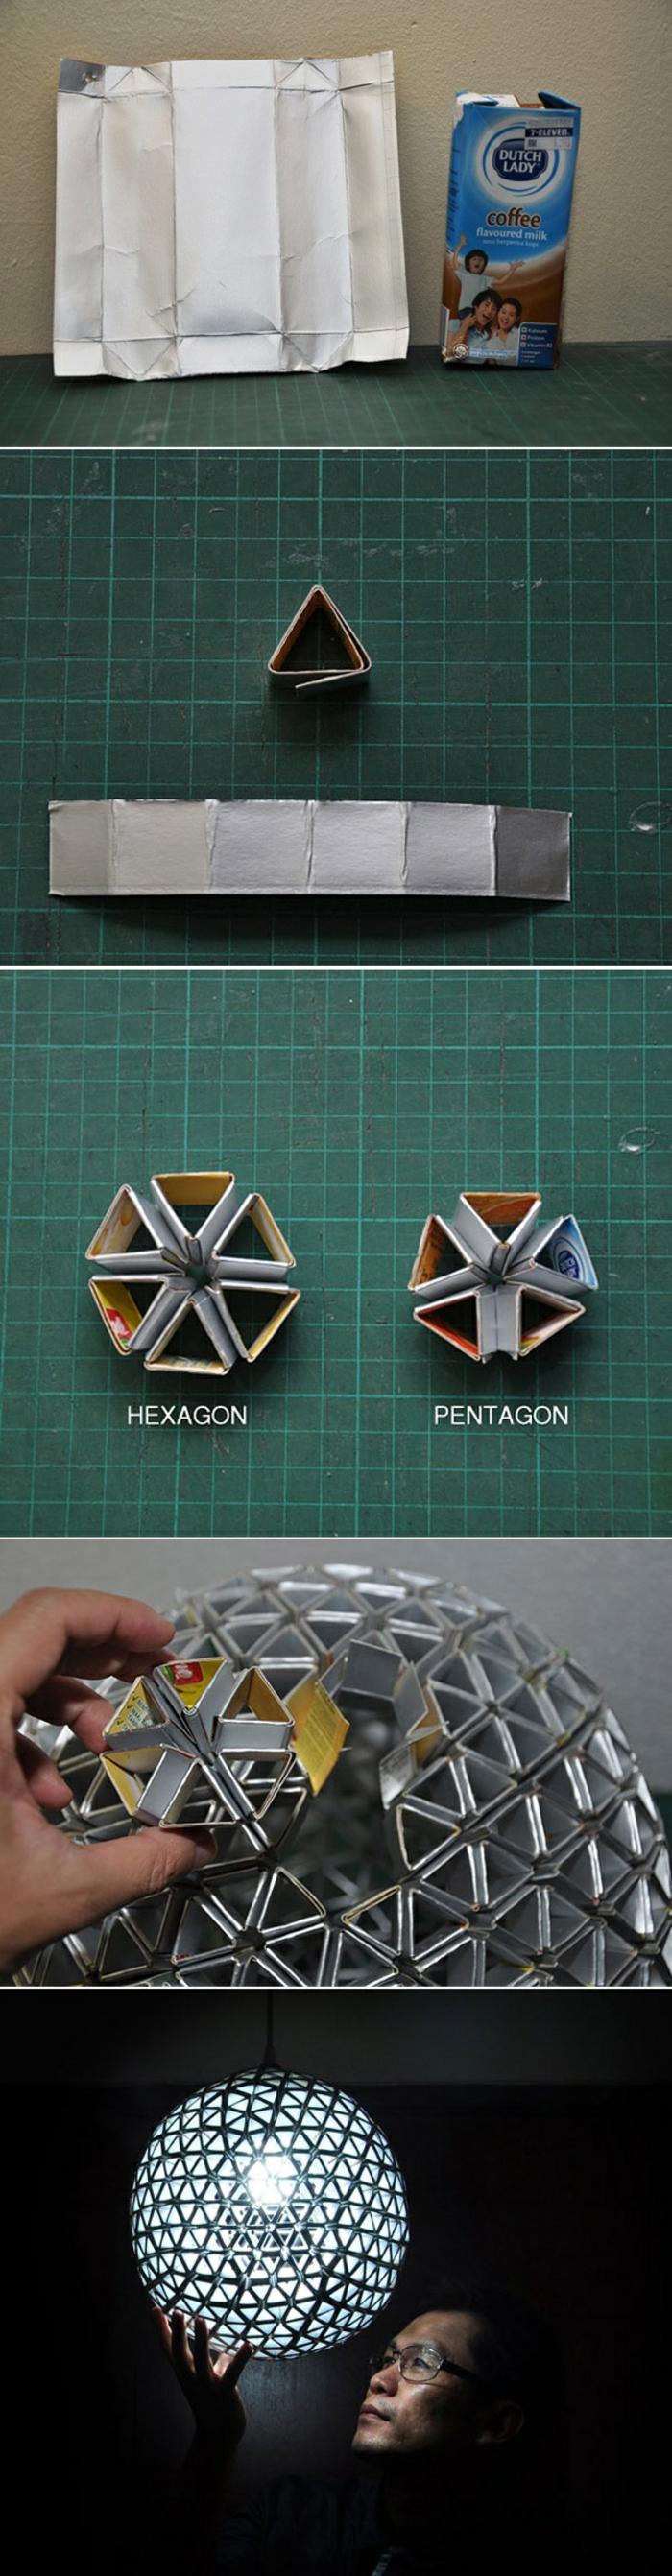 diy bastelideen, runden lampenschirm aus papier selber machen